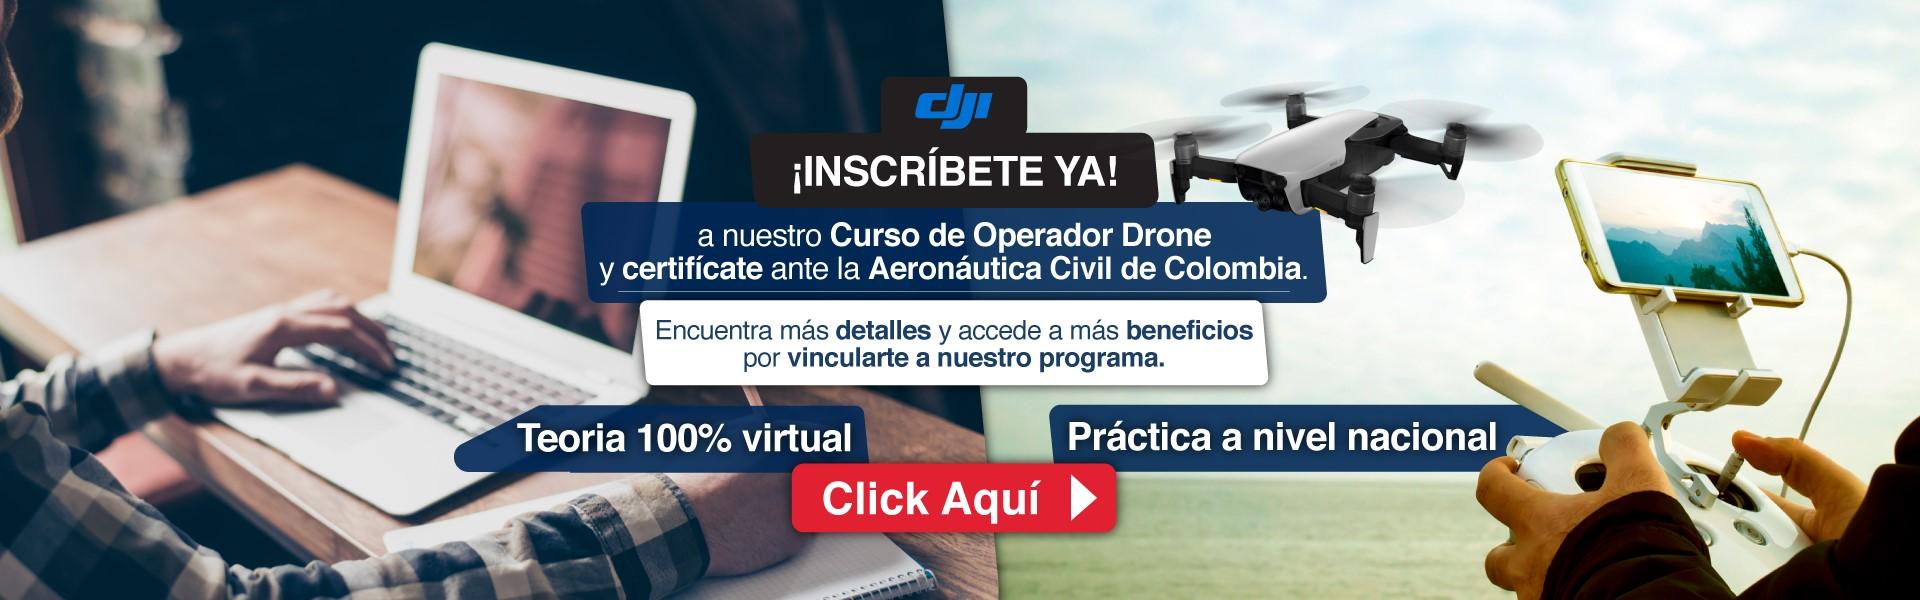 Banner-Fast-Track-Drones-nuevo